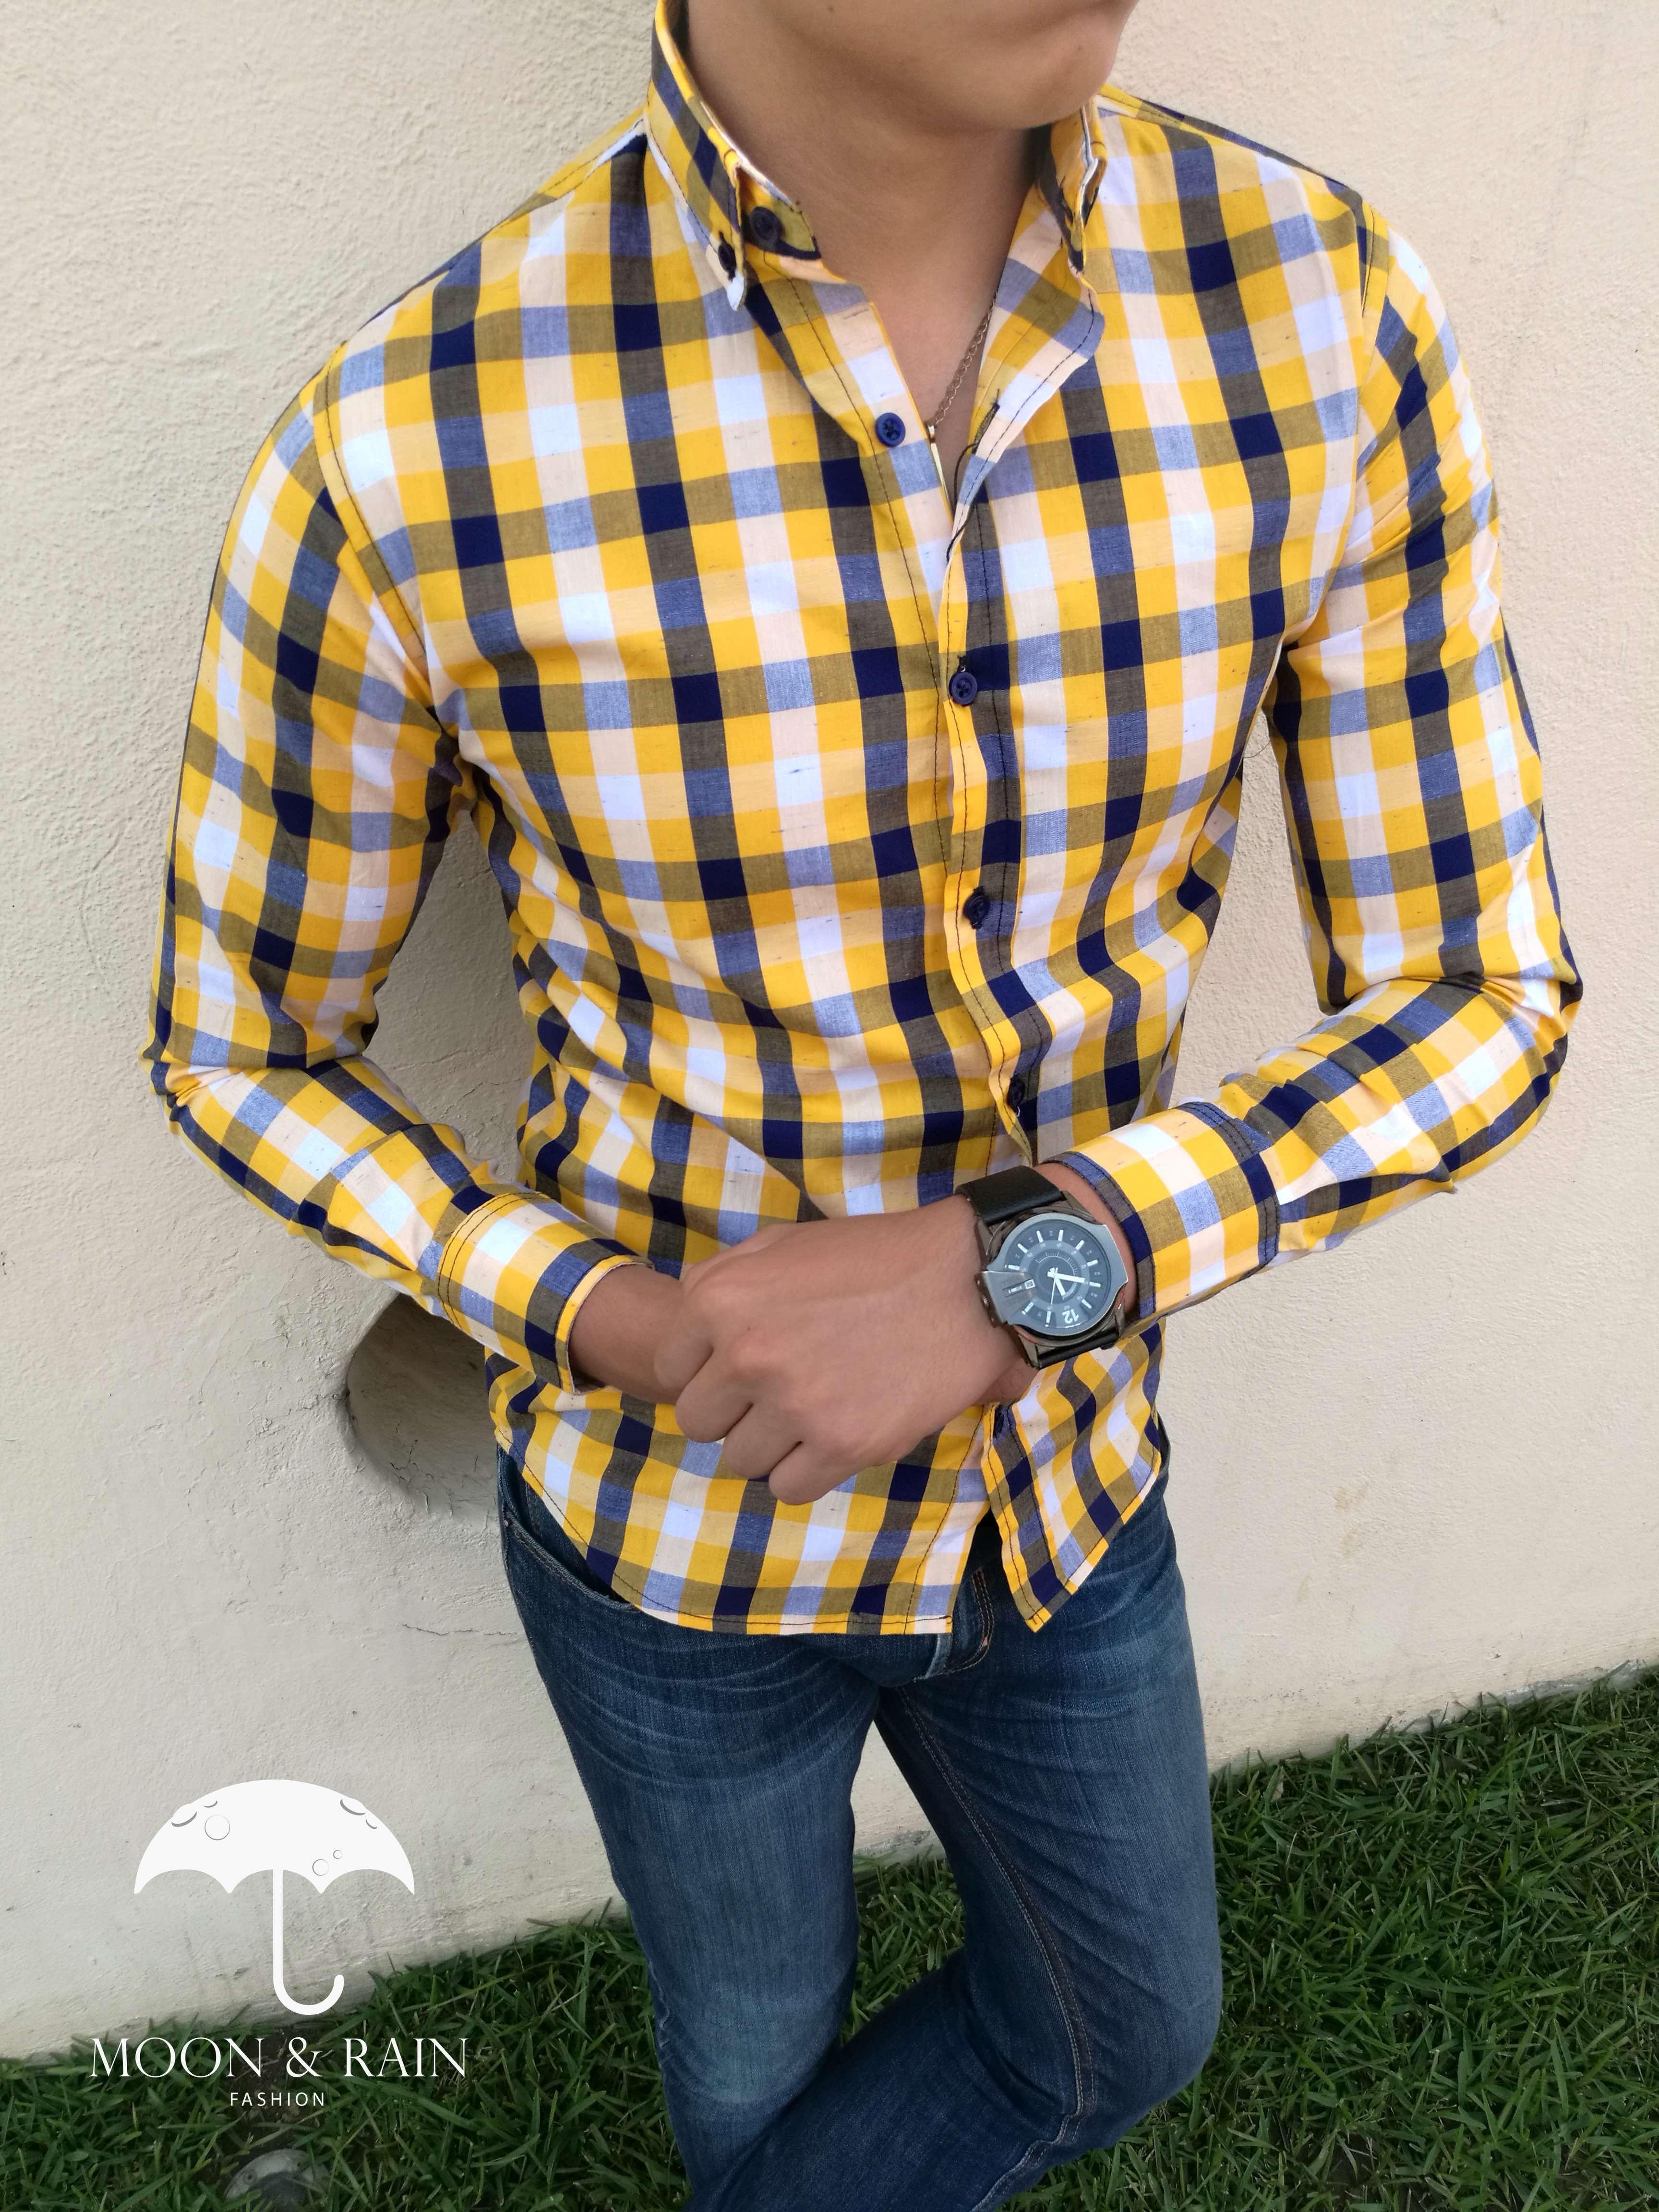 821d742835 Camisa de cuadros amarillos para hombre de moda por Moon   Rain Fashion